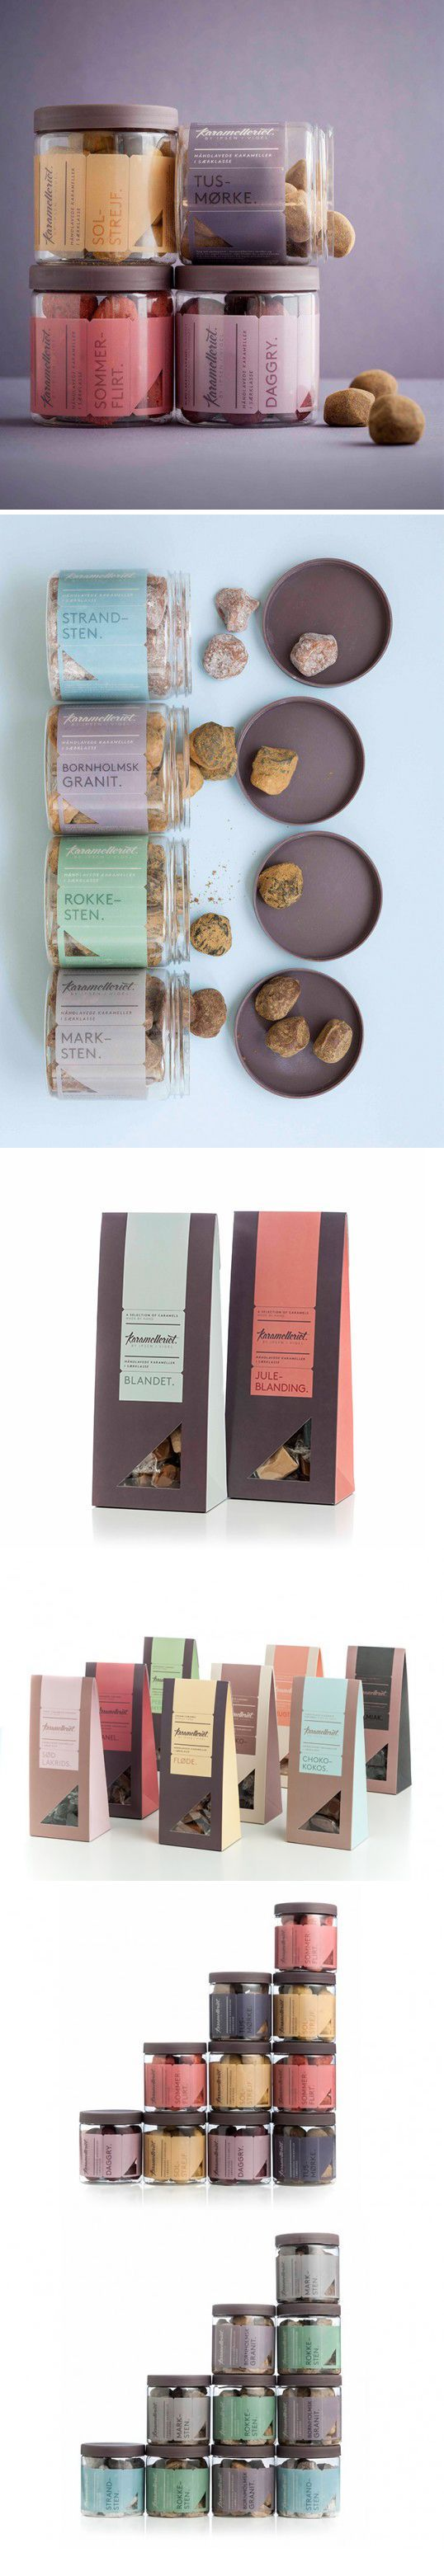 Chocolate #packaging design. Great colors palette http://lovelypackage.com/karamelleriet/